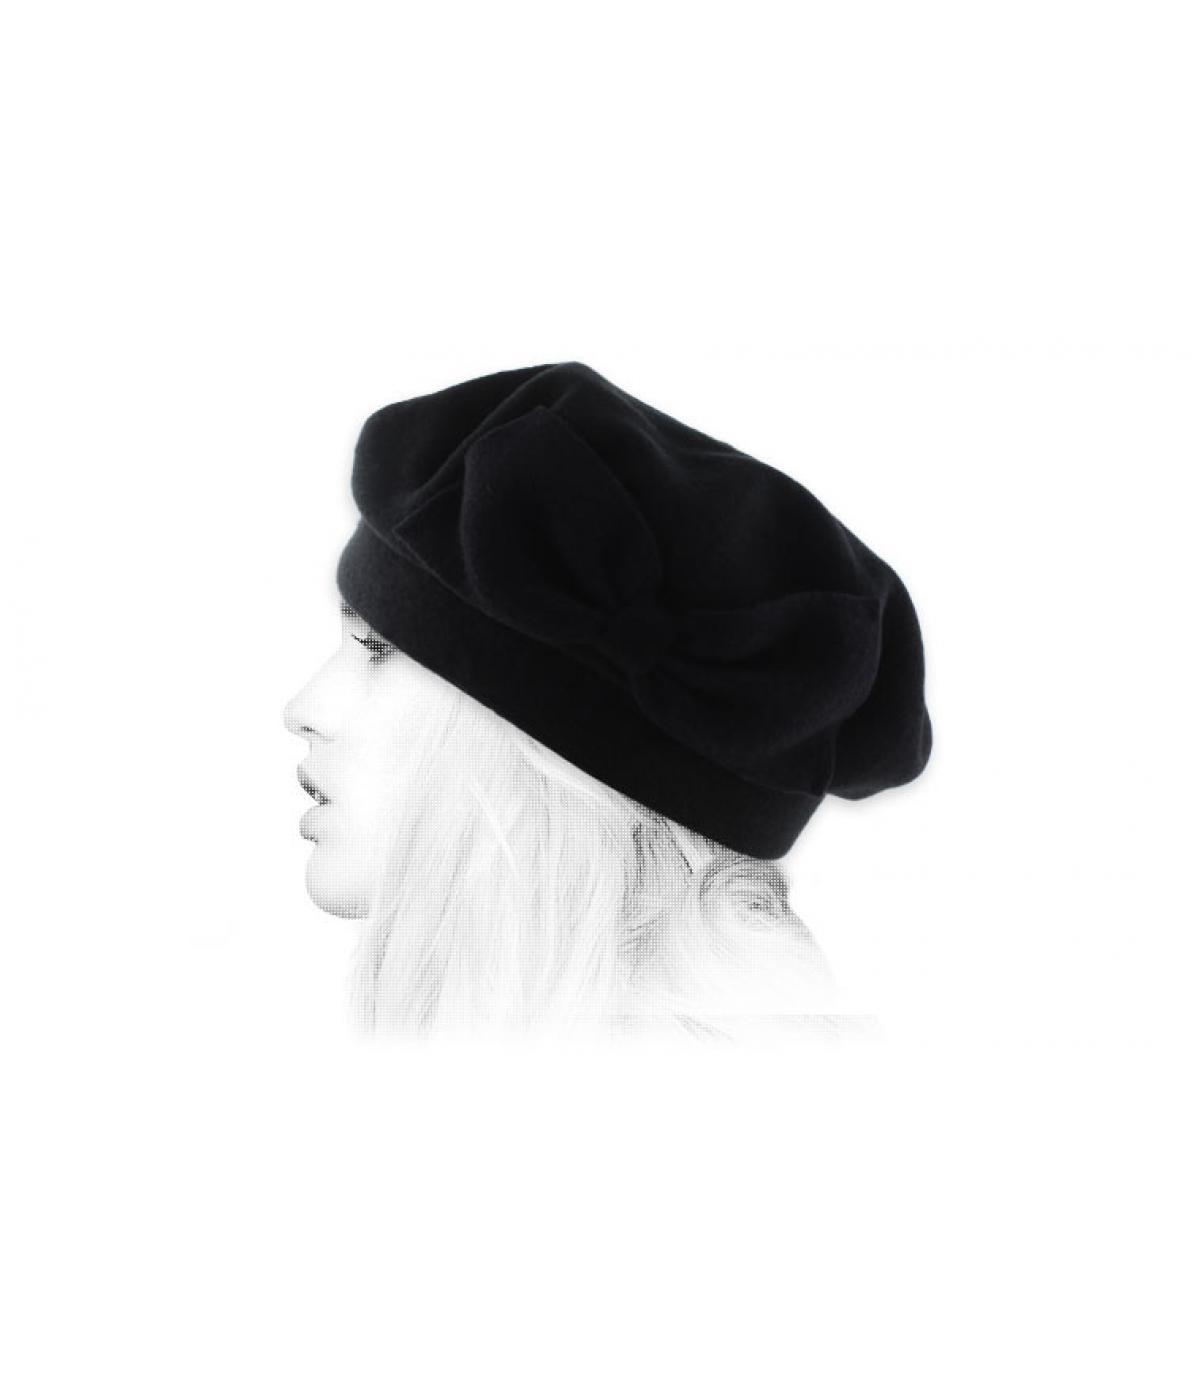 zwarte baret Laulhère knooppunt